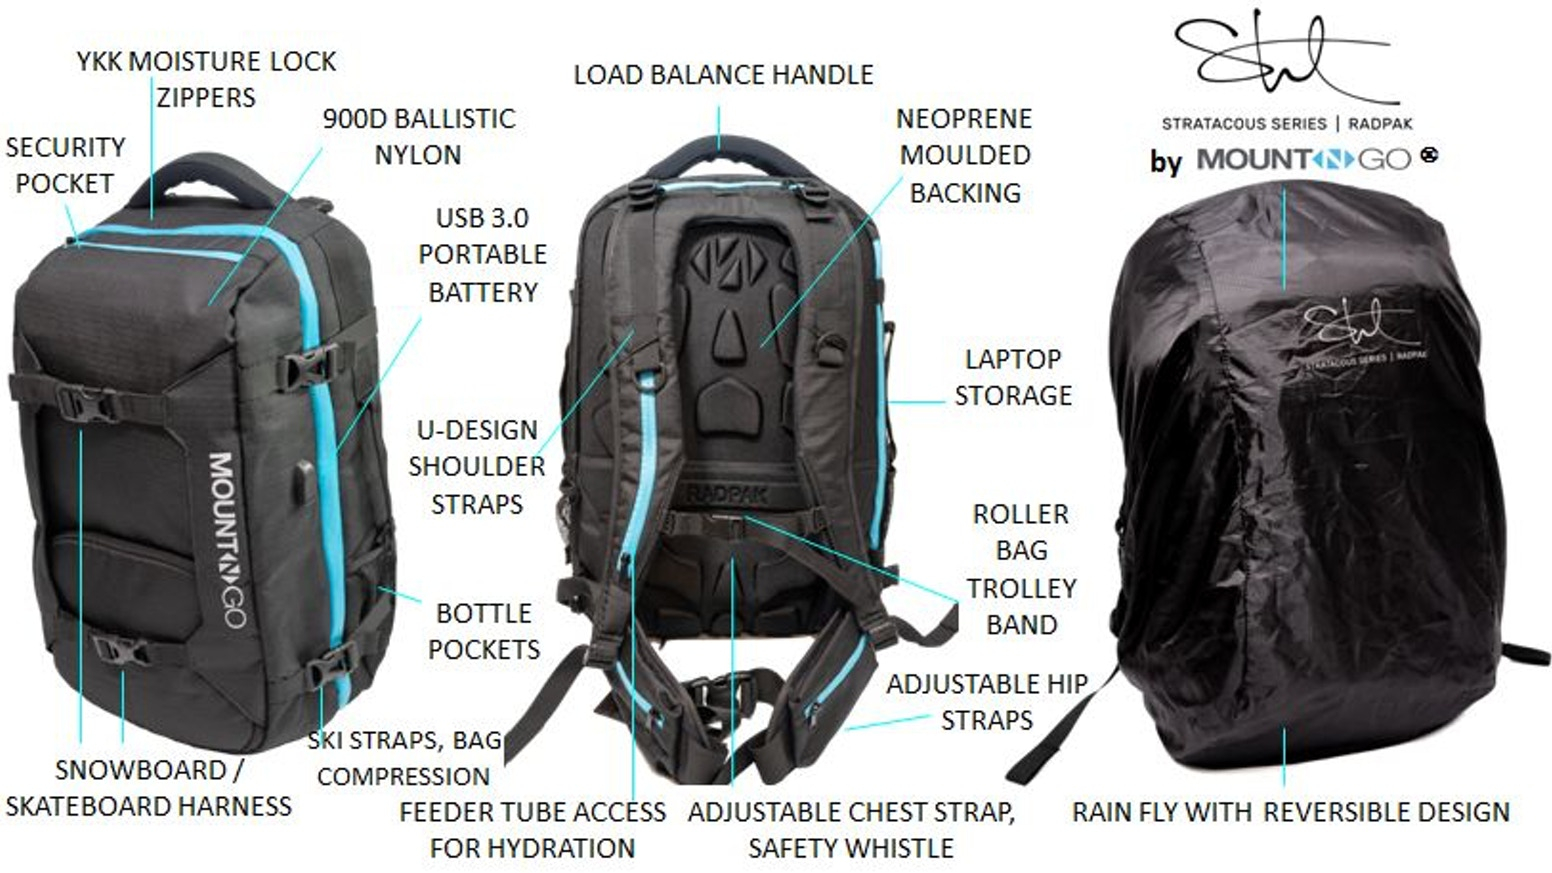 0c2e6a85845a8 The Stratacous Series RADPAK Backpack by Strat Streetman — Kickstarter